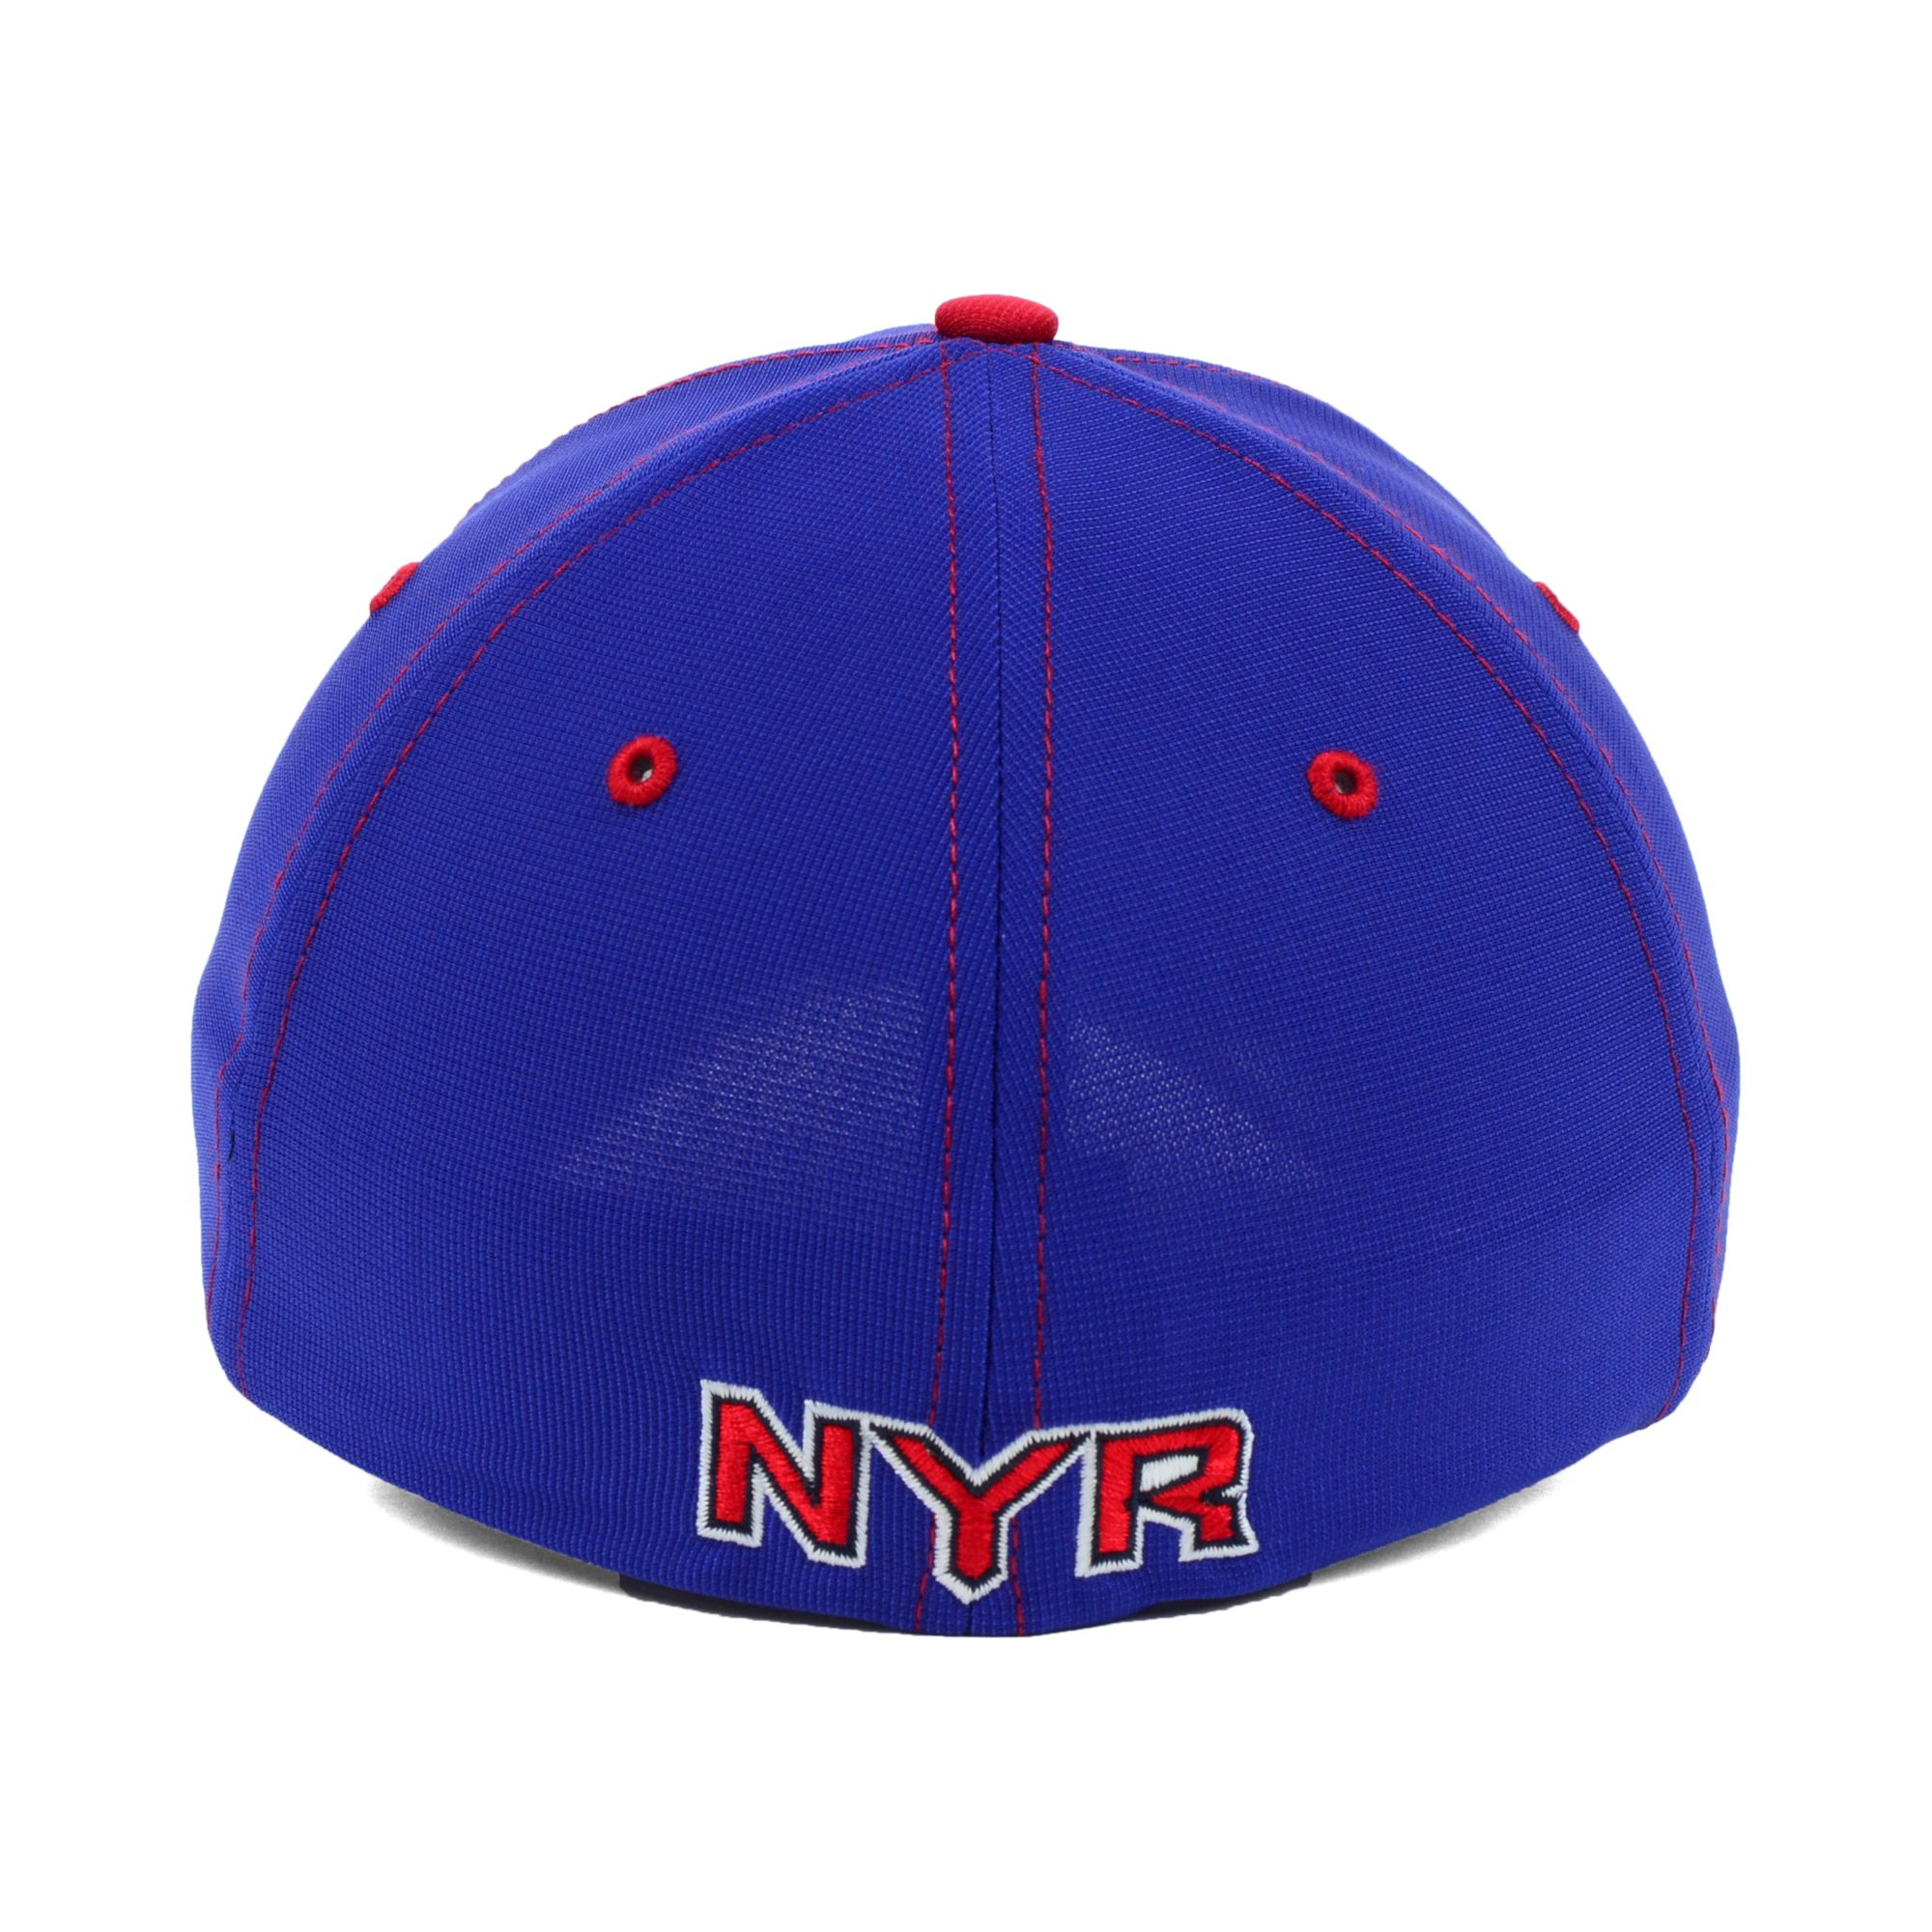 low priced e7241 490fb ... adidas nhl 2tone adjustable cap 1e16svd5z56t e4d43 f9eb3  czech  authentic lyst 47 brand new york rangers nhl dark twig flex cap in blue  88794